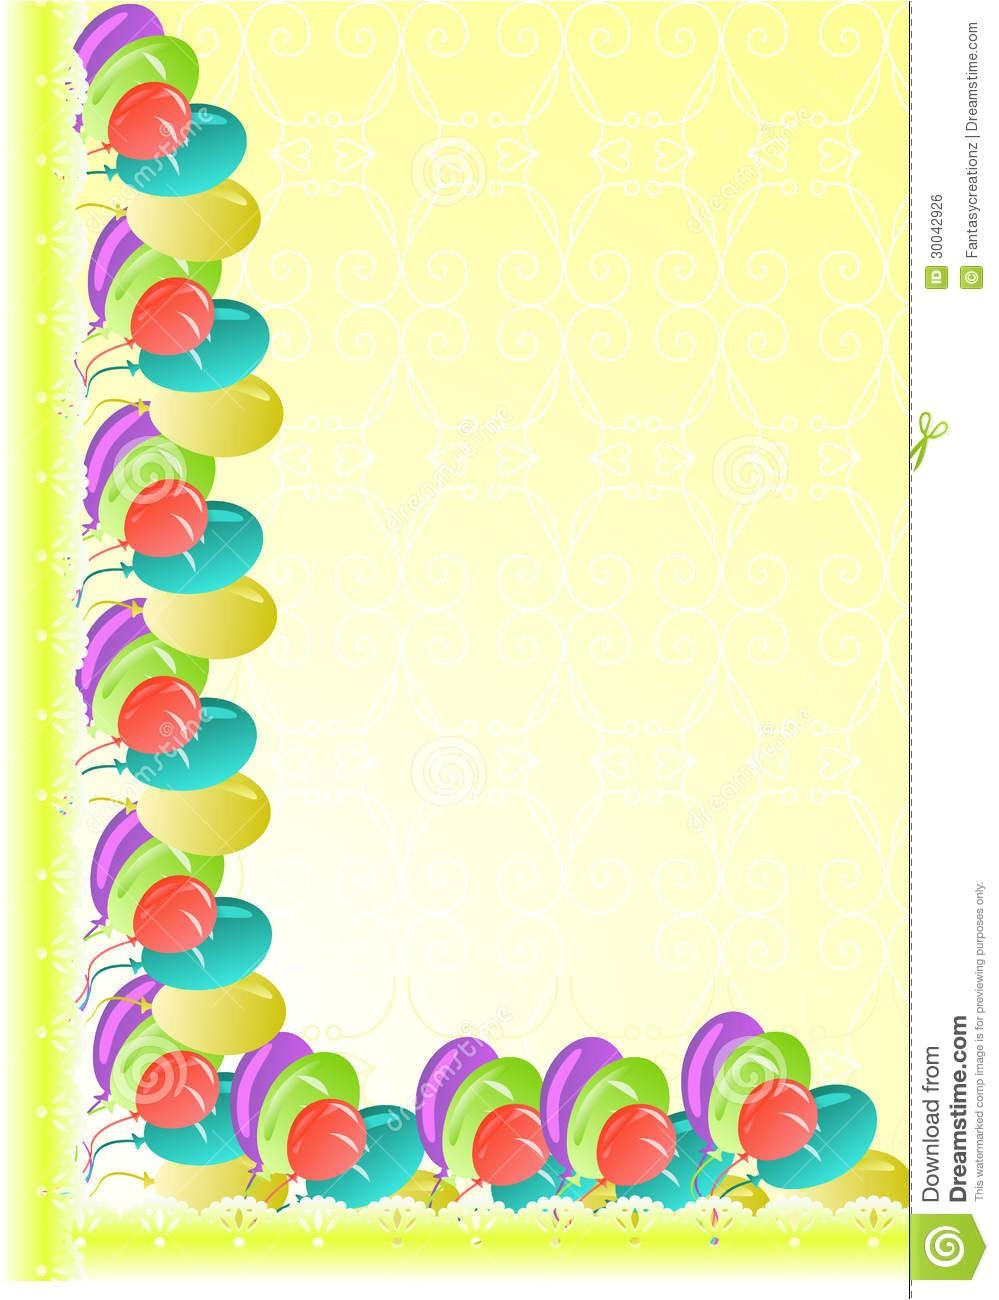 Birthday Invitation Frames and Borders Party Border Royalty Free Stock Image Image